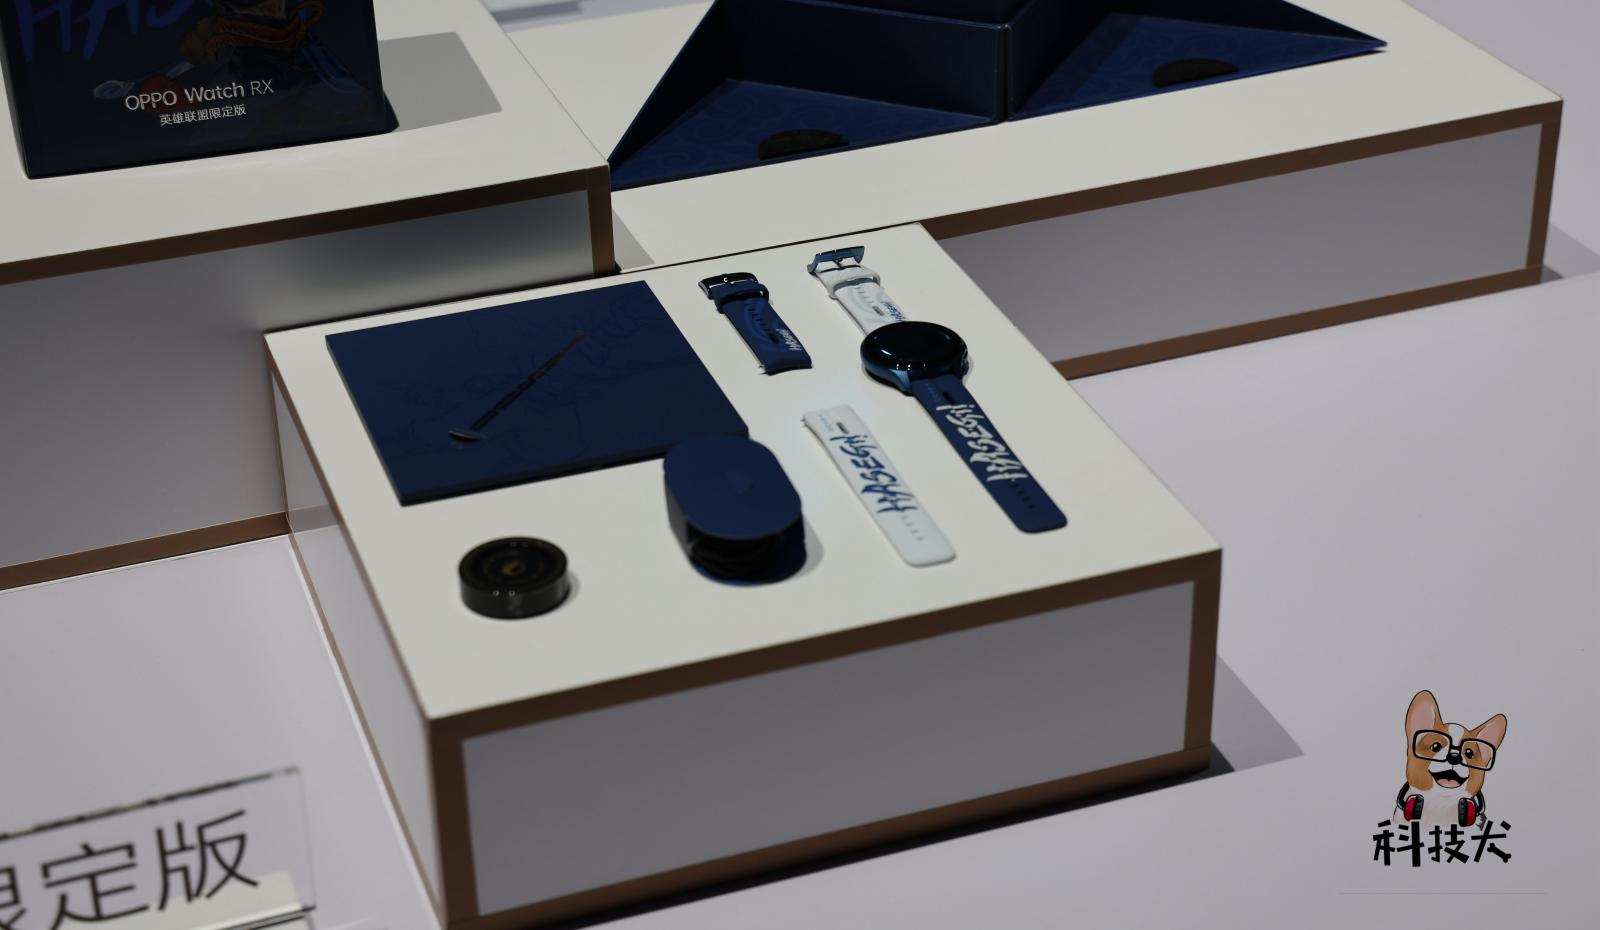 OPPO Watch英雄联盟限定版、智能电视S1正式开售